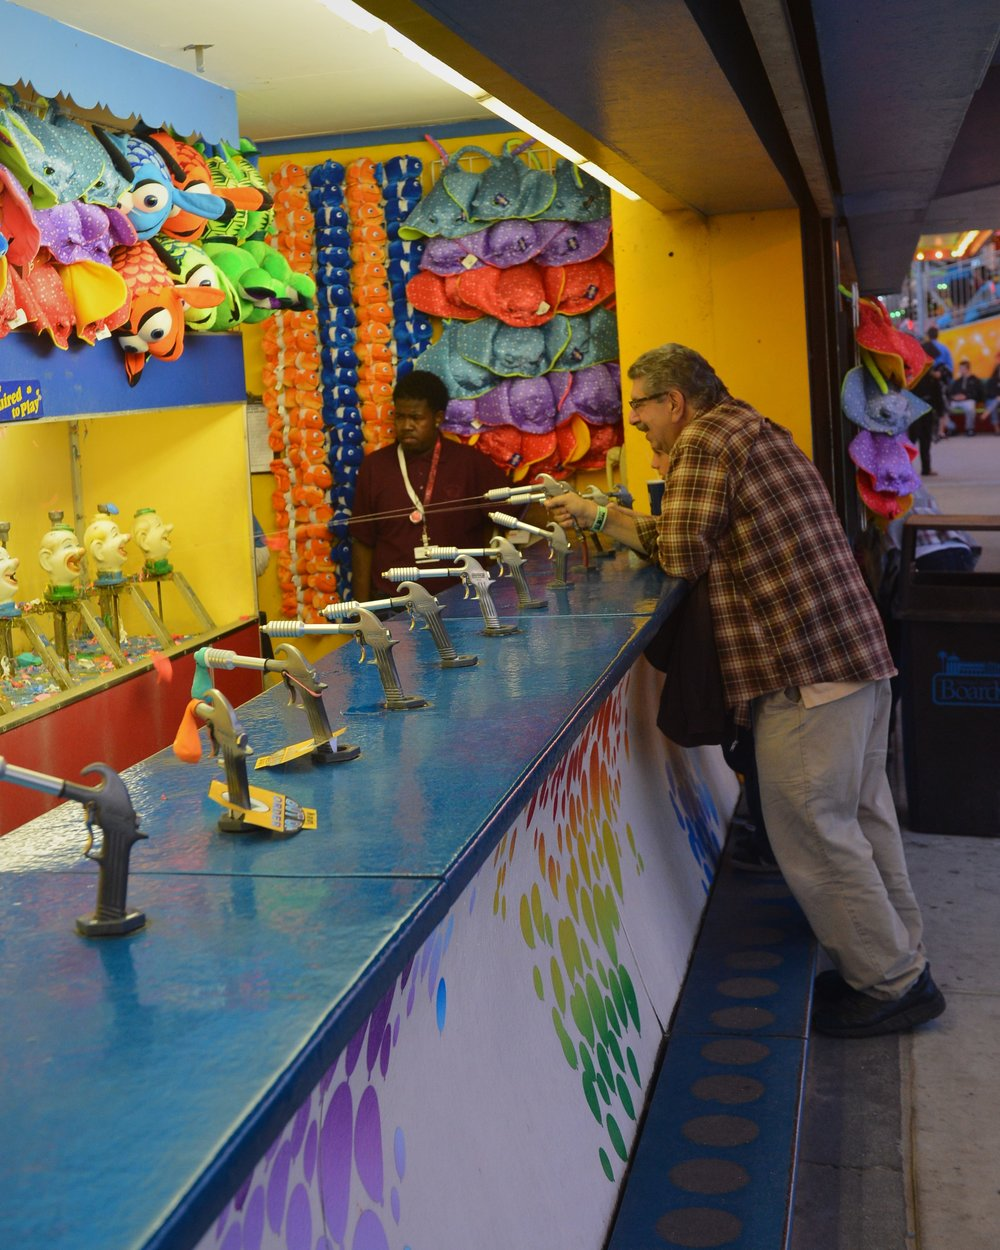 Water baloon contest, Santa Cruiz, Ca